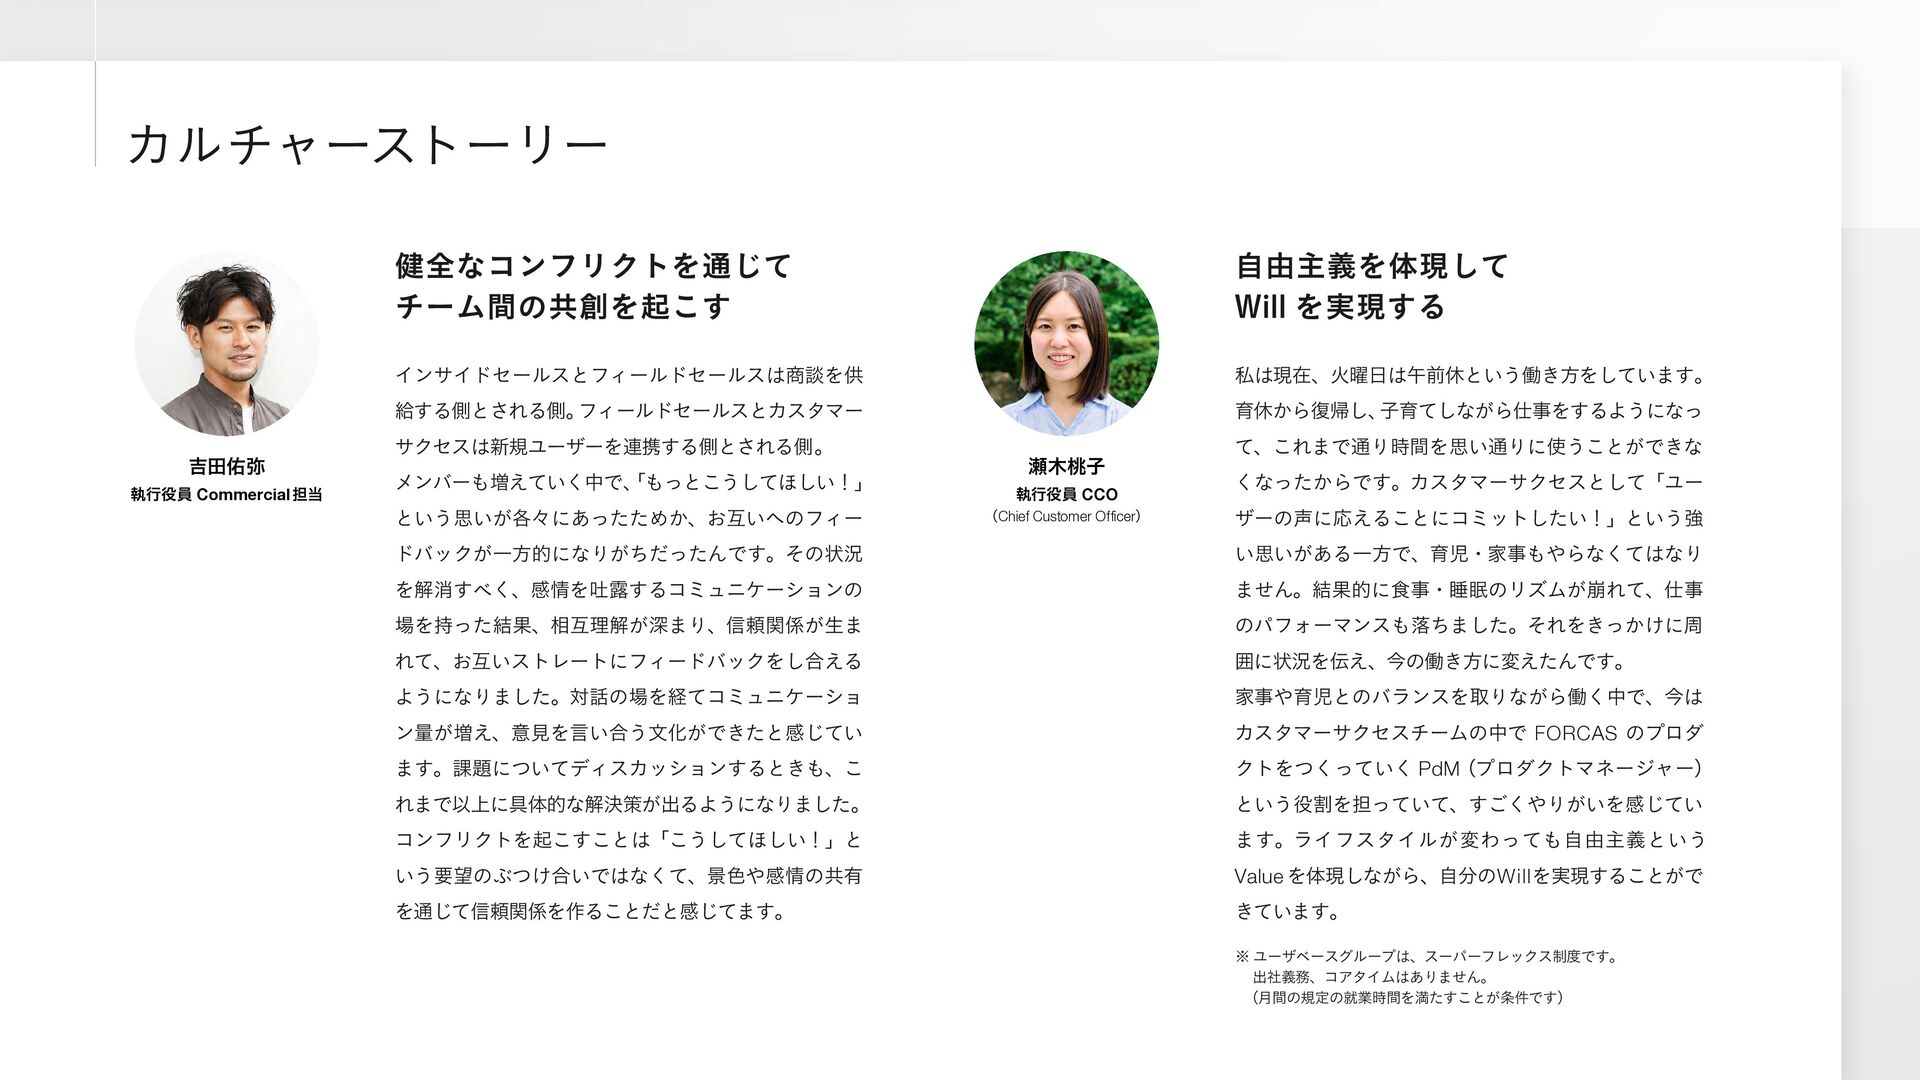 CULTURE STORY ᶄ ࣗ༝ओٛΛମݱͯ͠ 8JMM Λ࣮ݱ͢Δ ࢲݱࡏɺՐ༵ޕ...